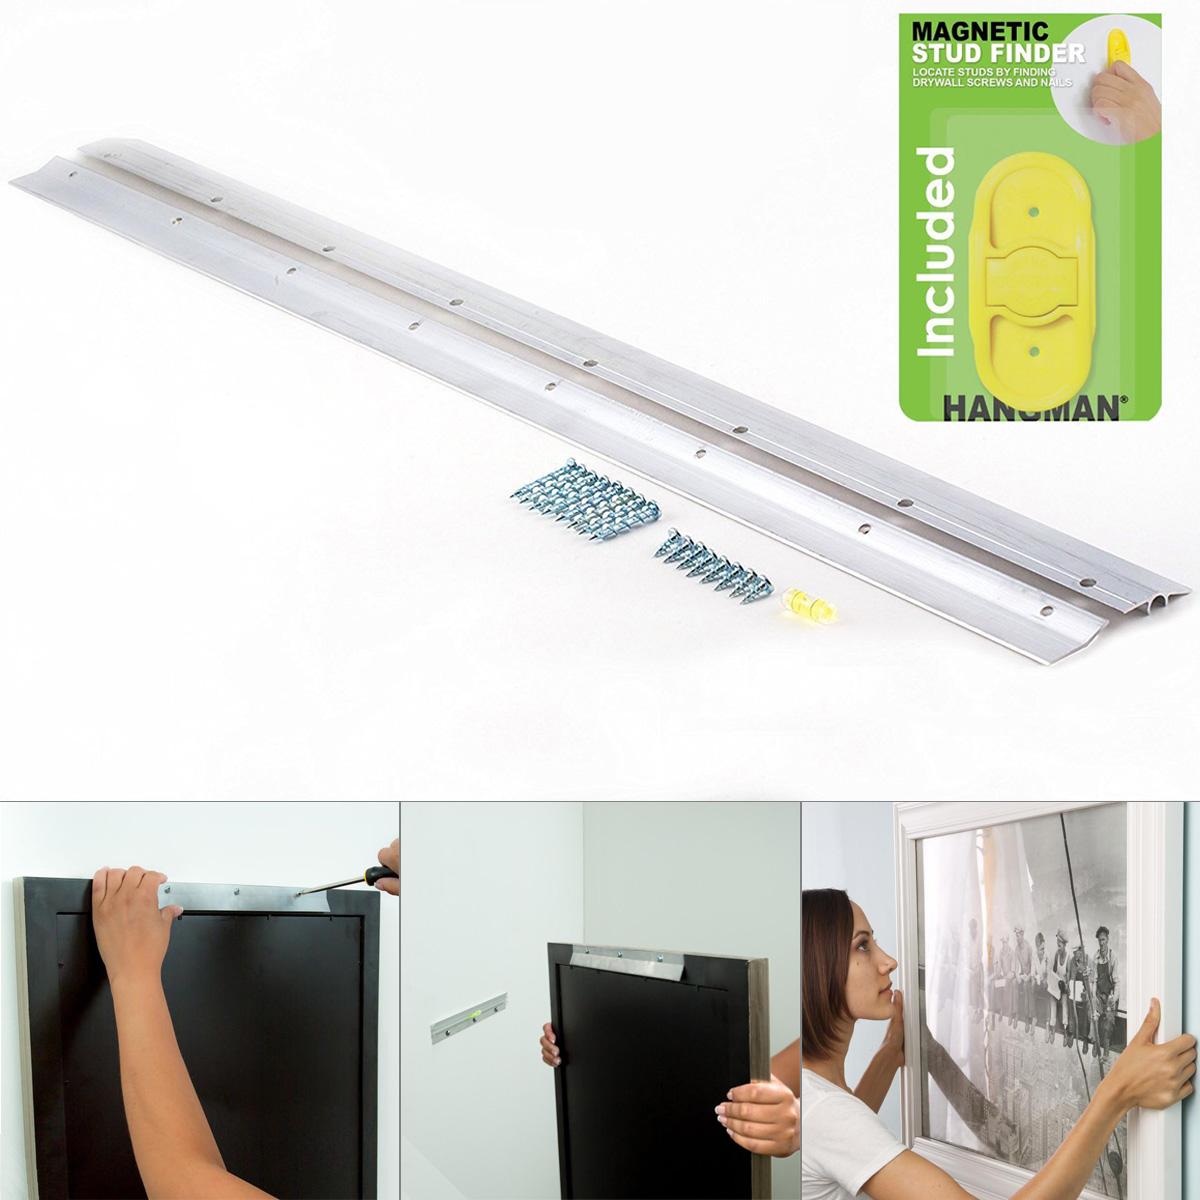 Heavy Duty Mirror Picture Hangers 6 To 42 Models Hangman